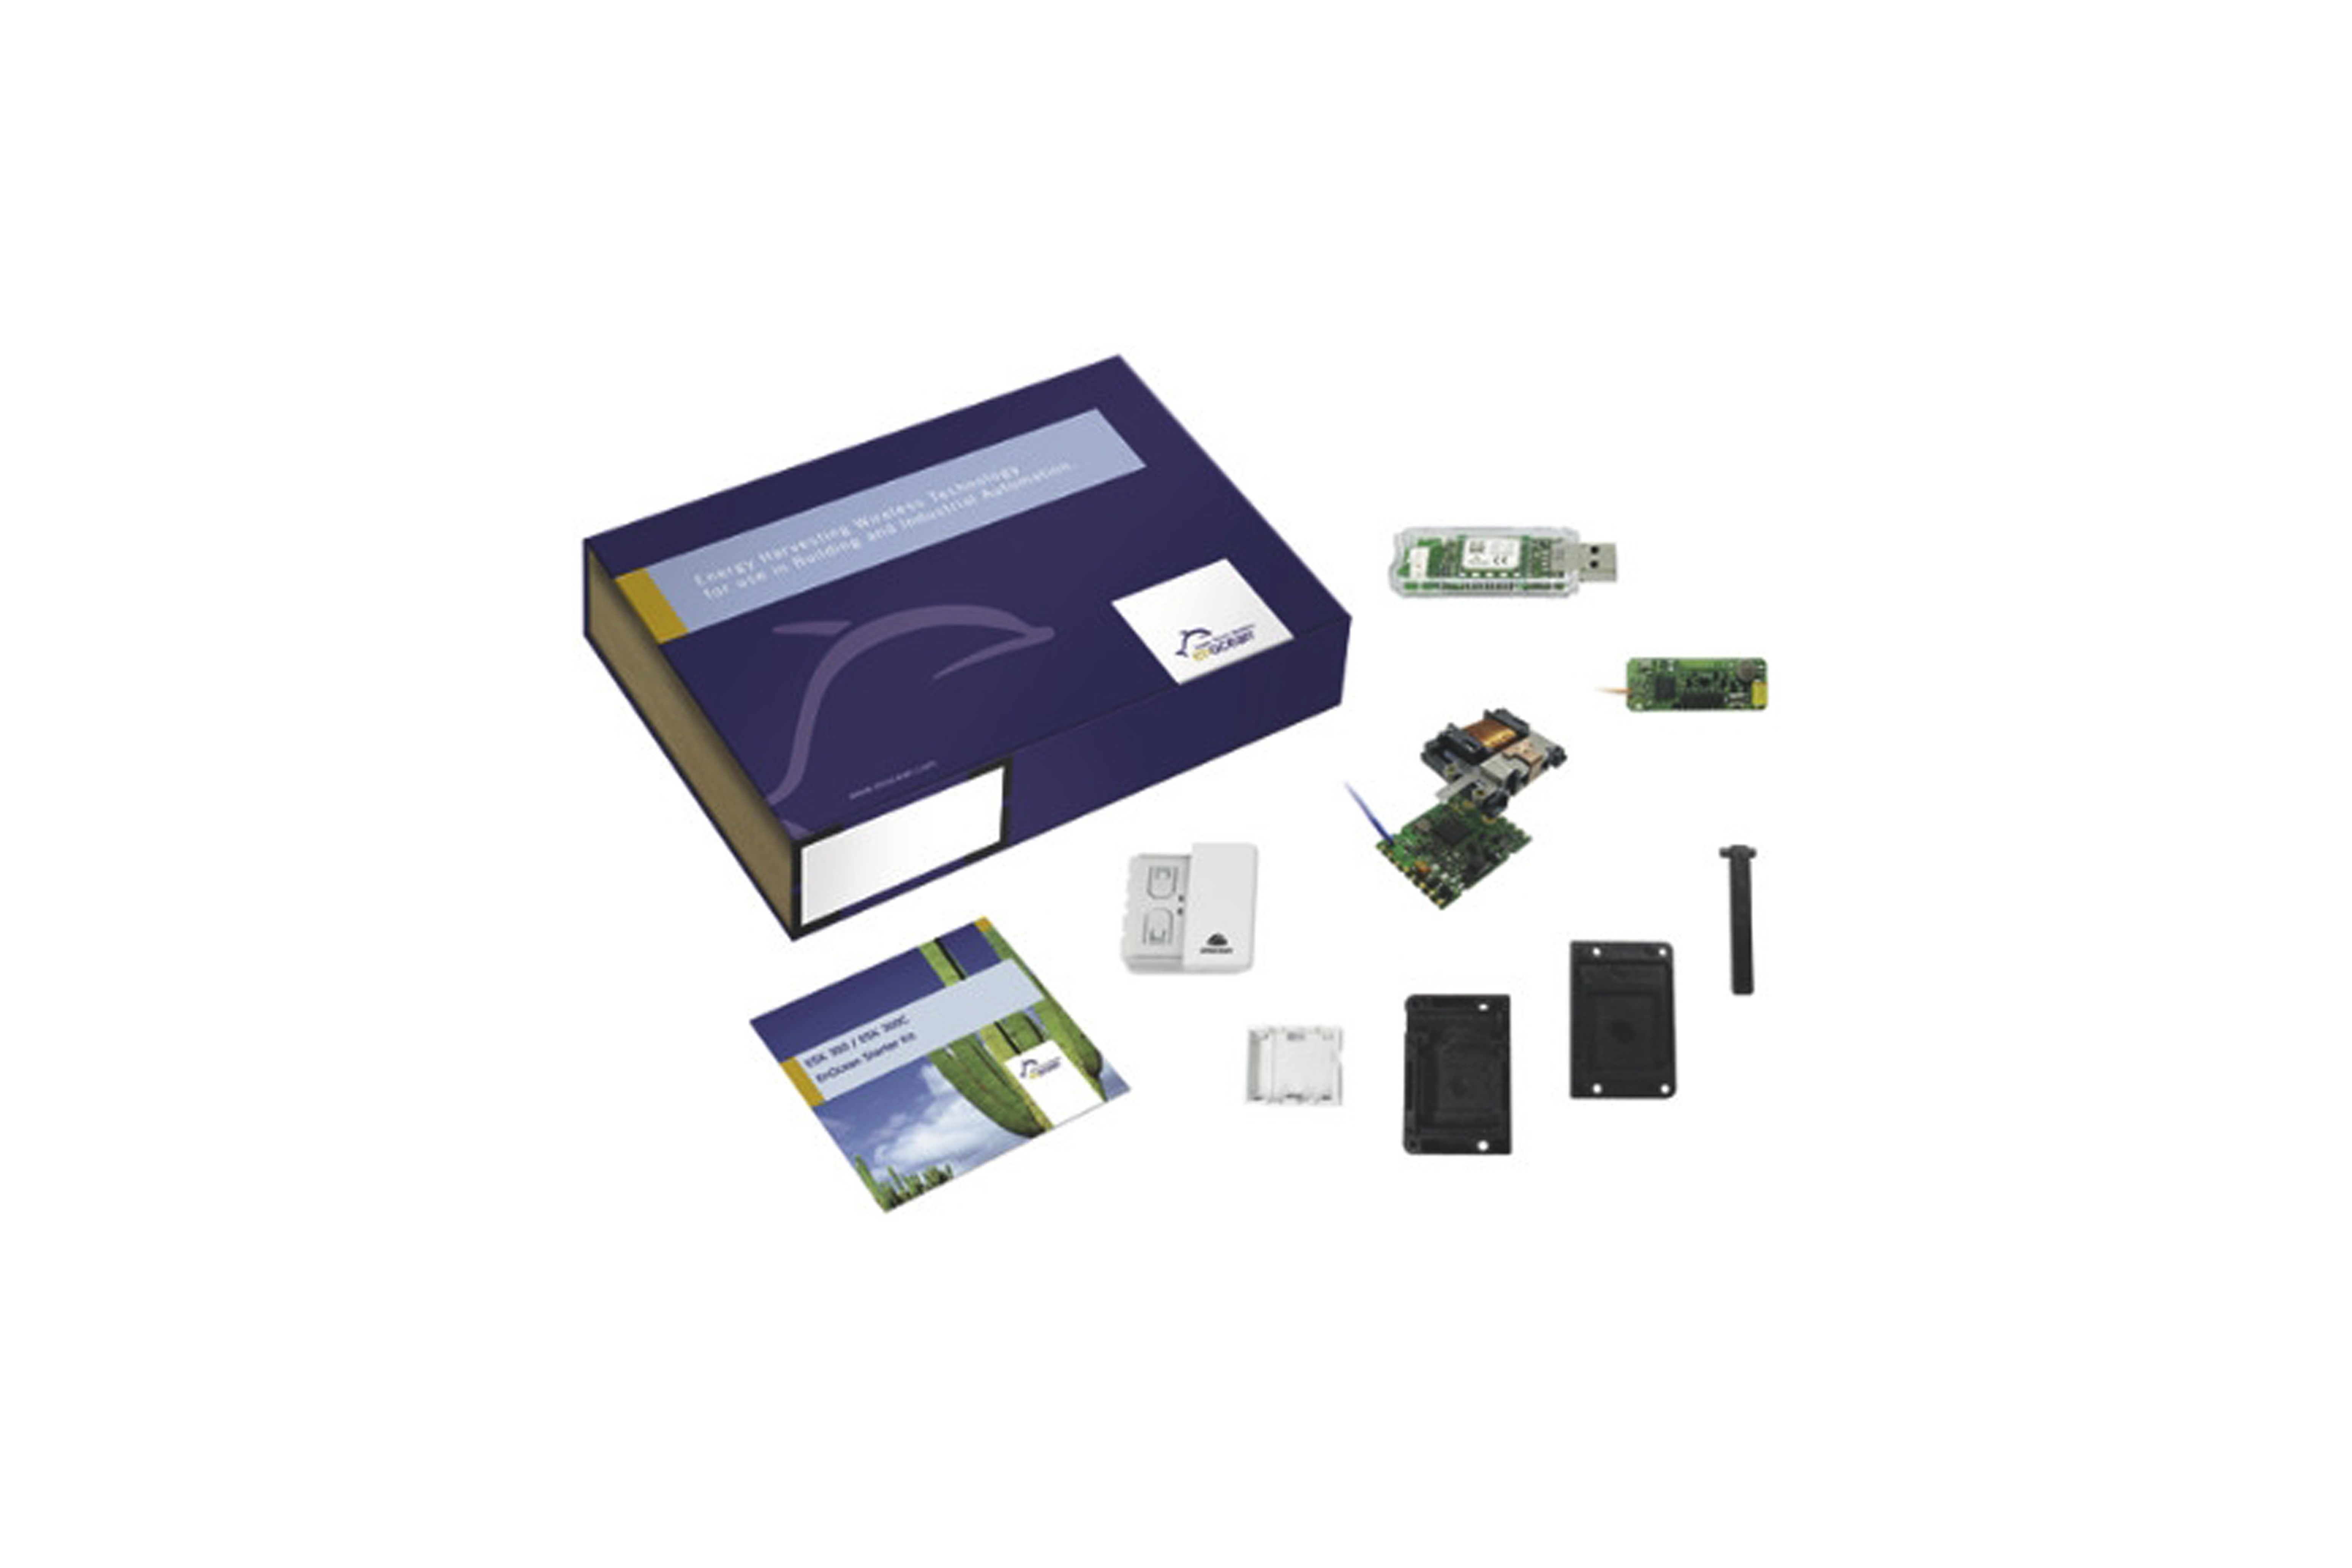 Energieoogster, 868 MHz-startpakket